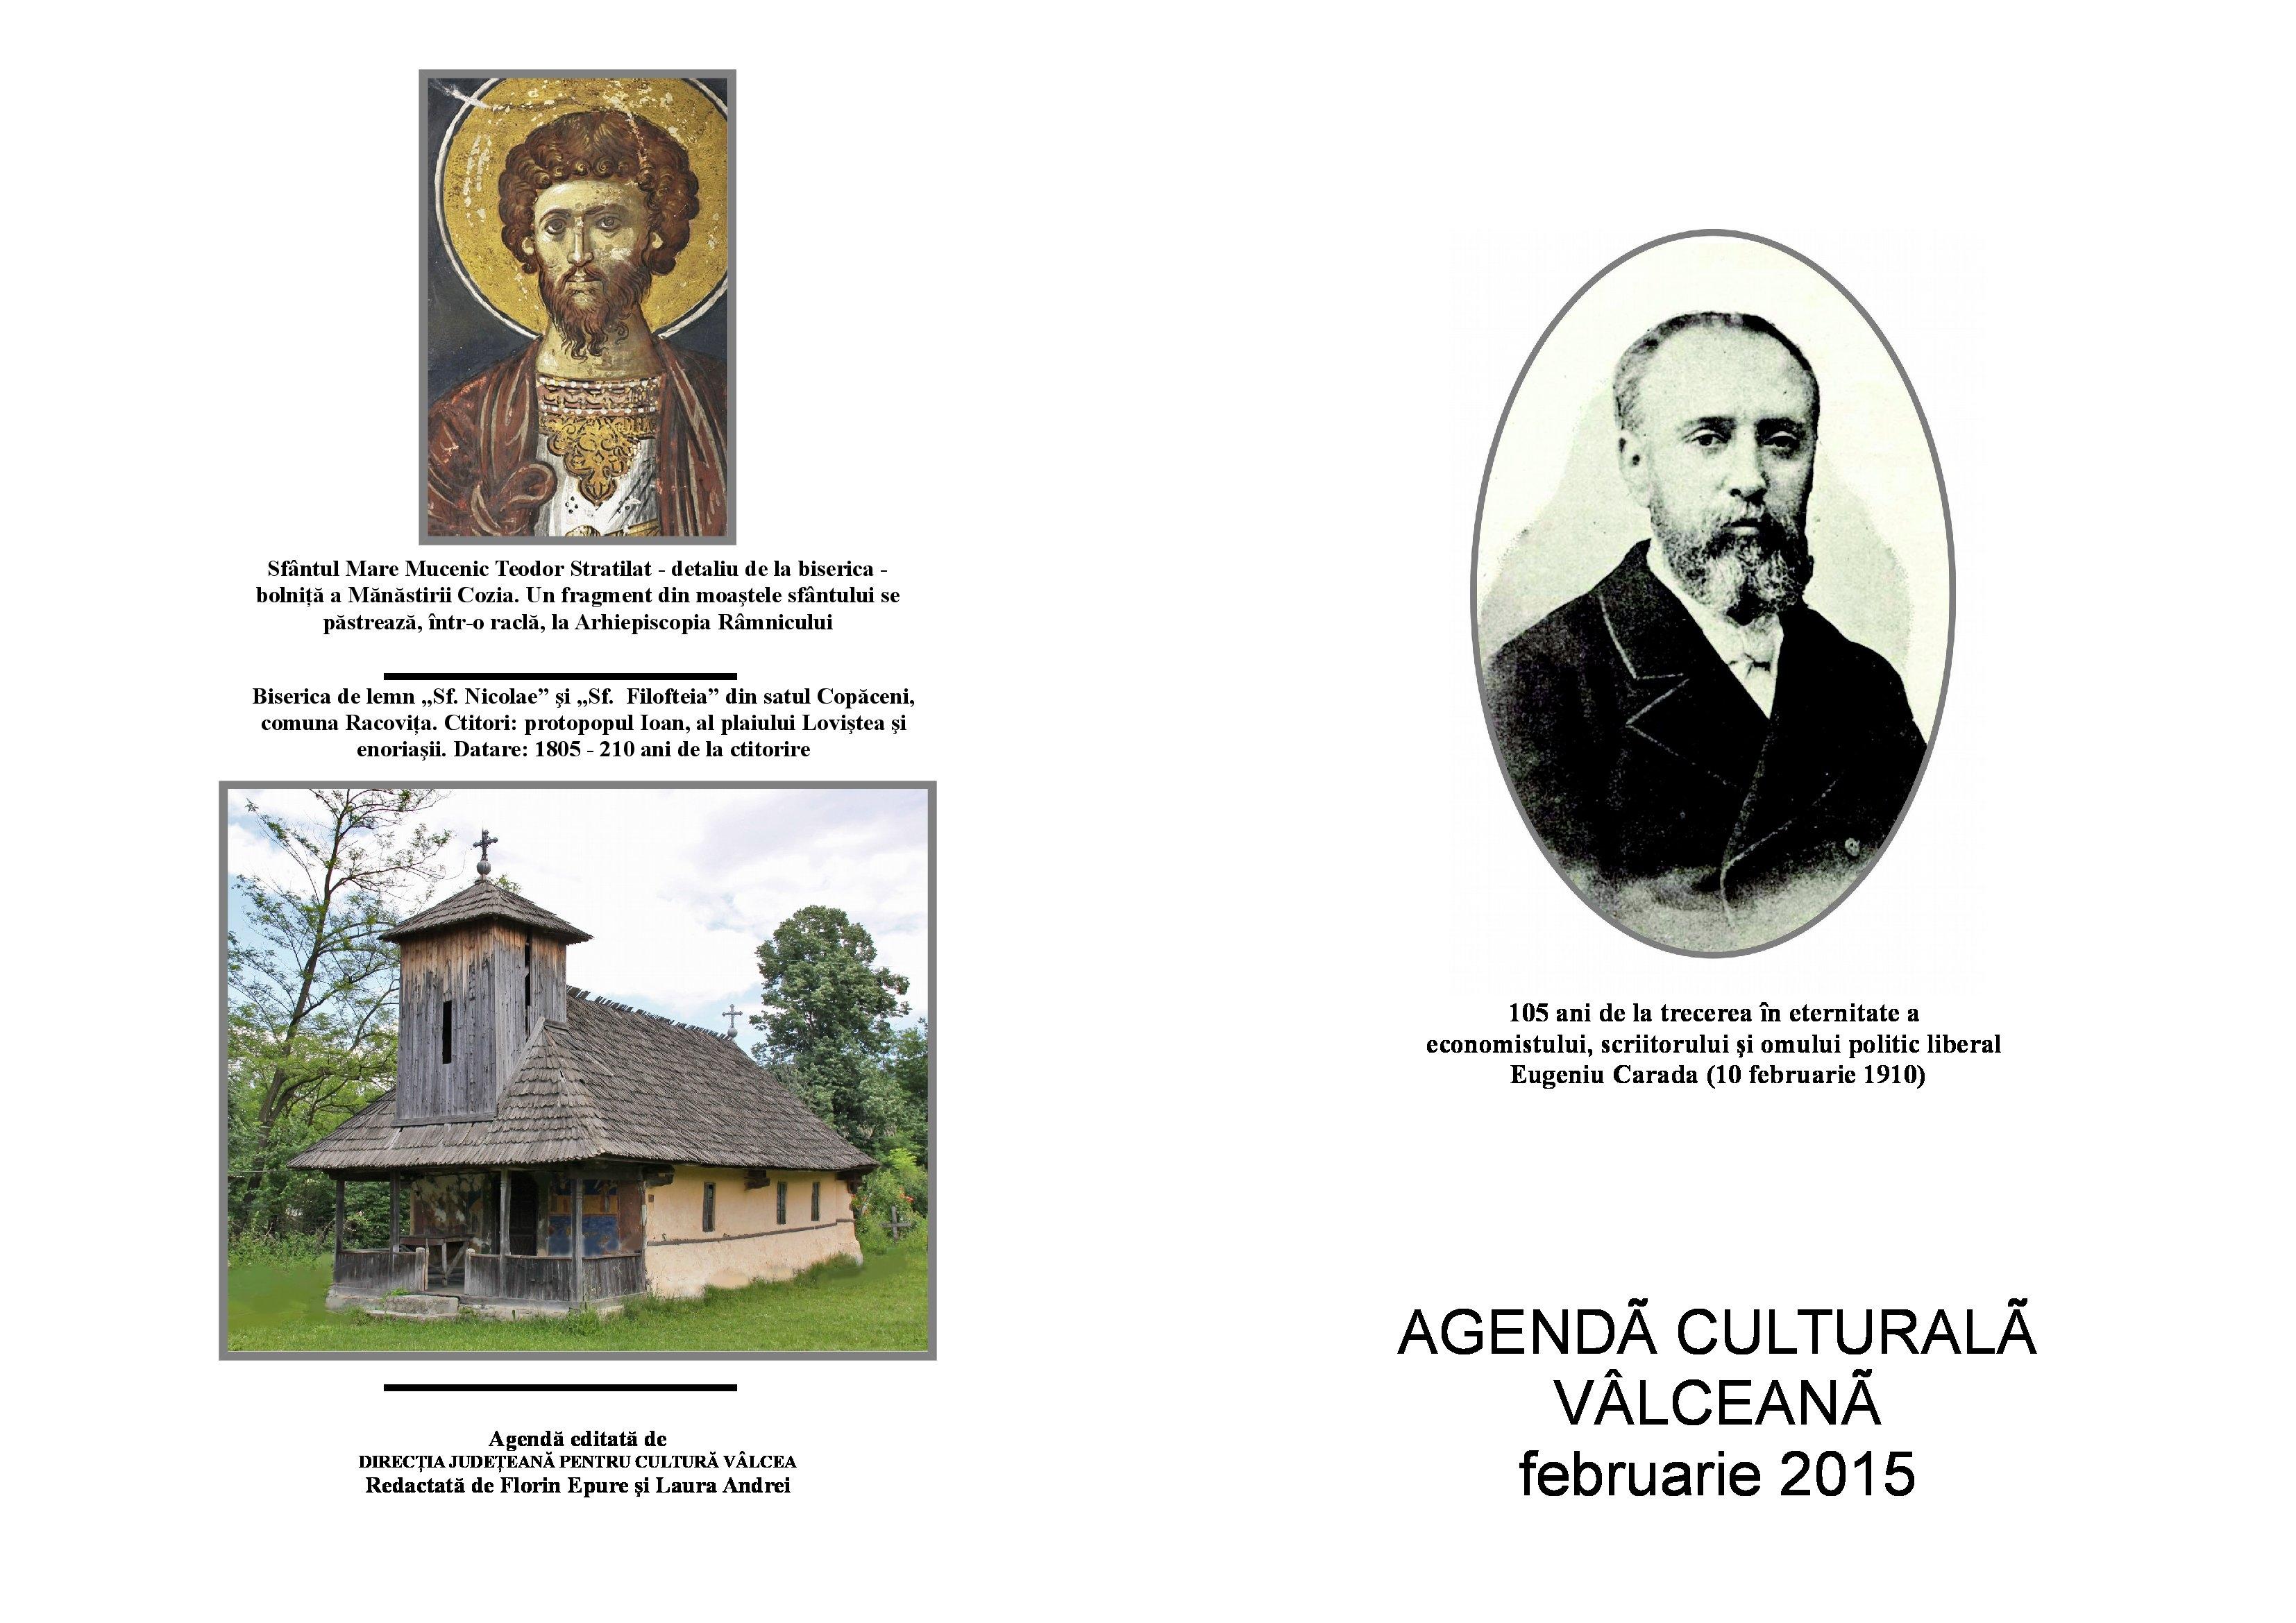 Agenda Culturala Valceana, februarie 2015